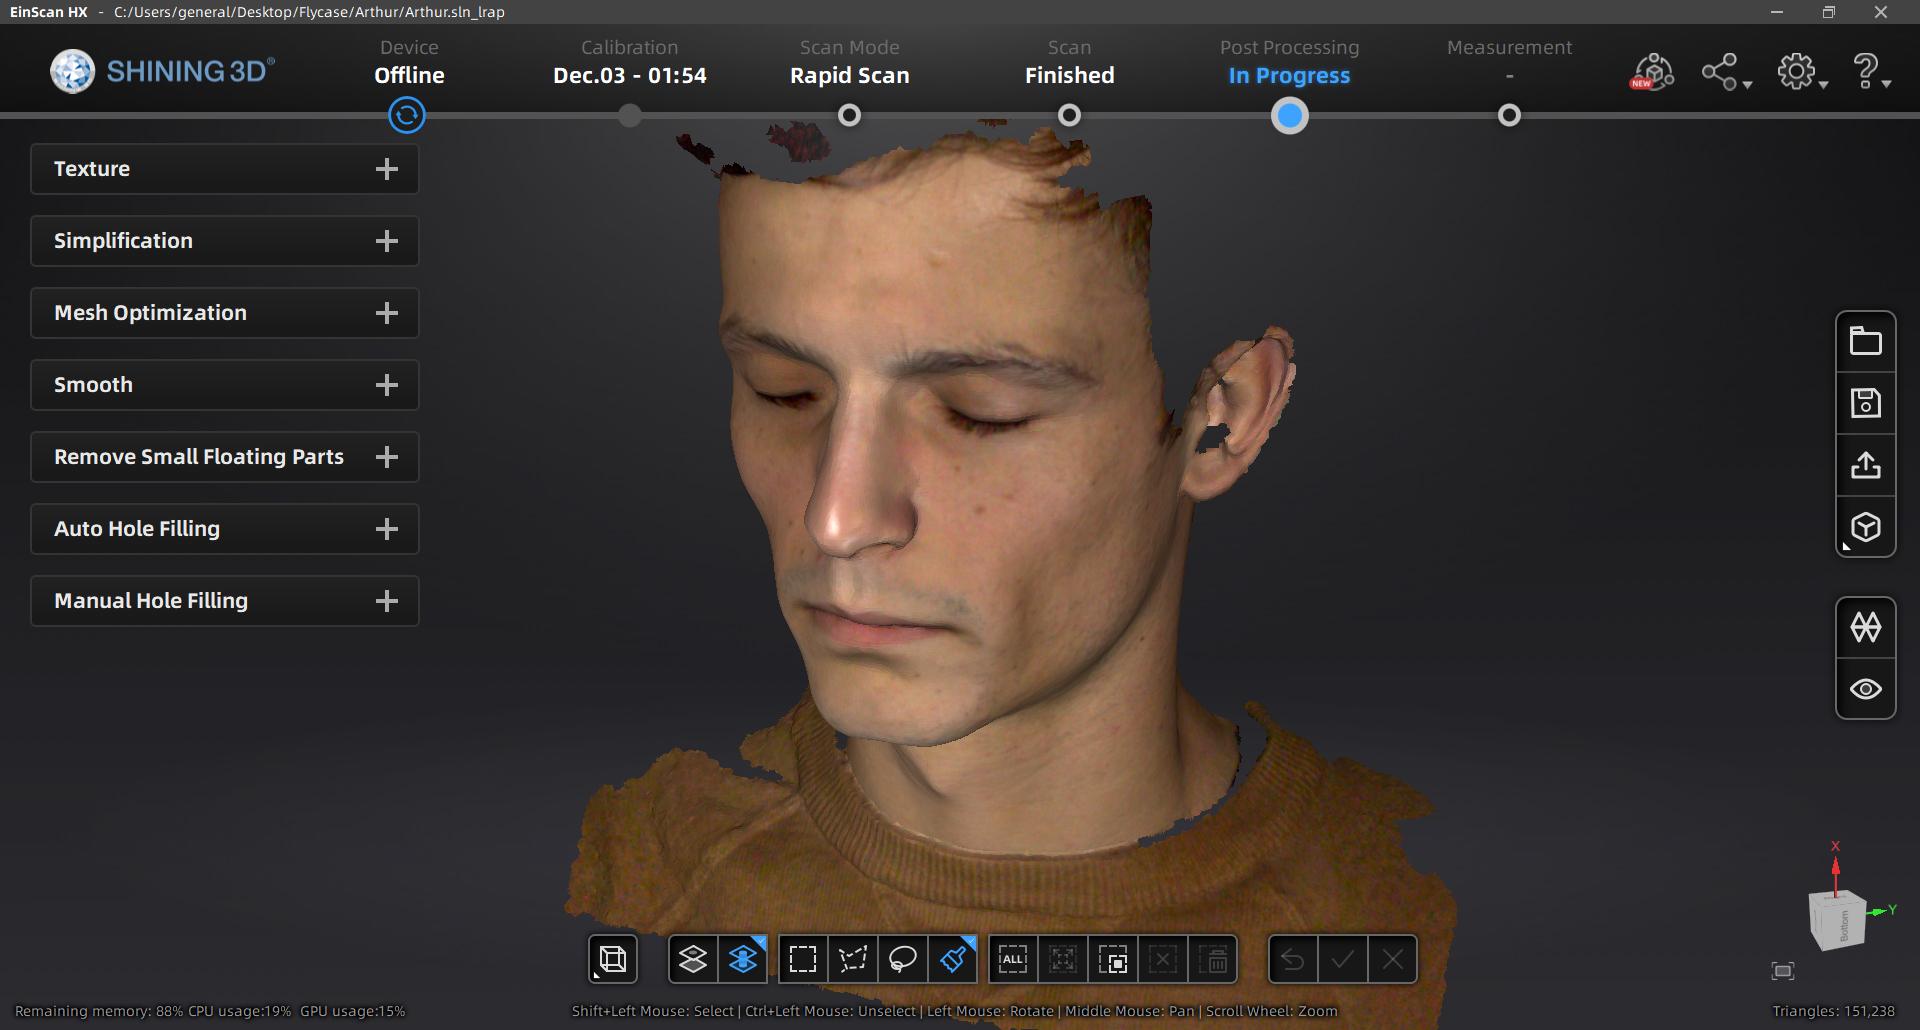 Human head 3D scan